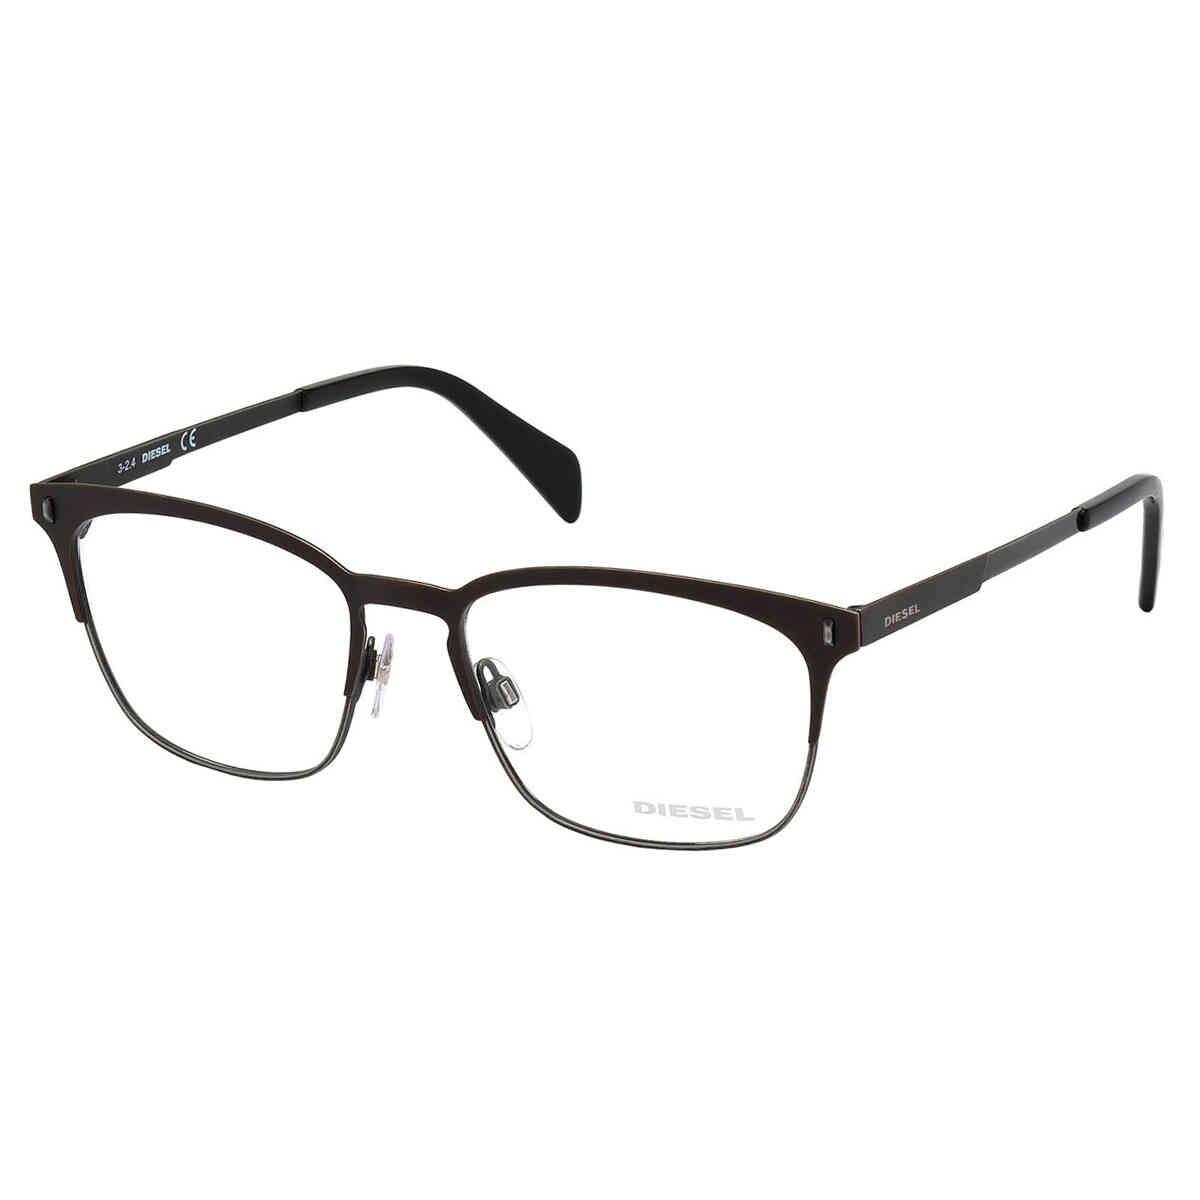 Óculos de Grau Diesel Masculino DL5121